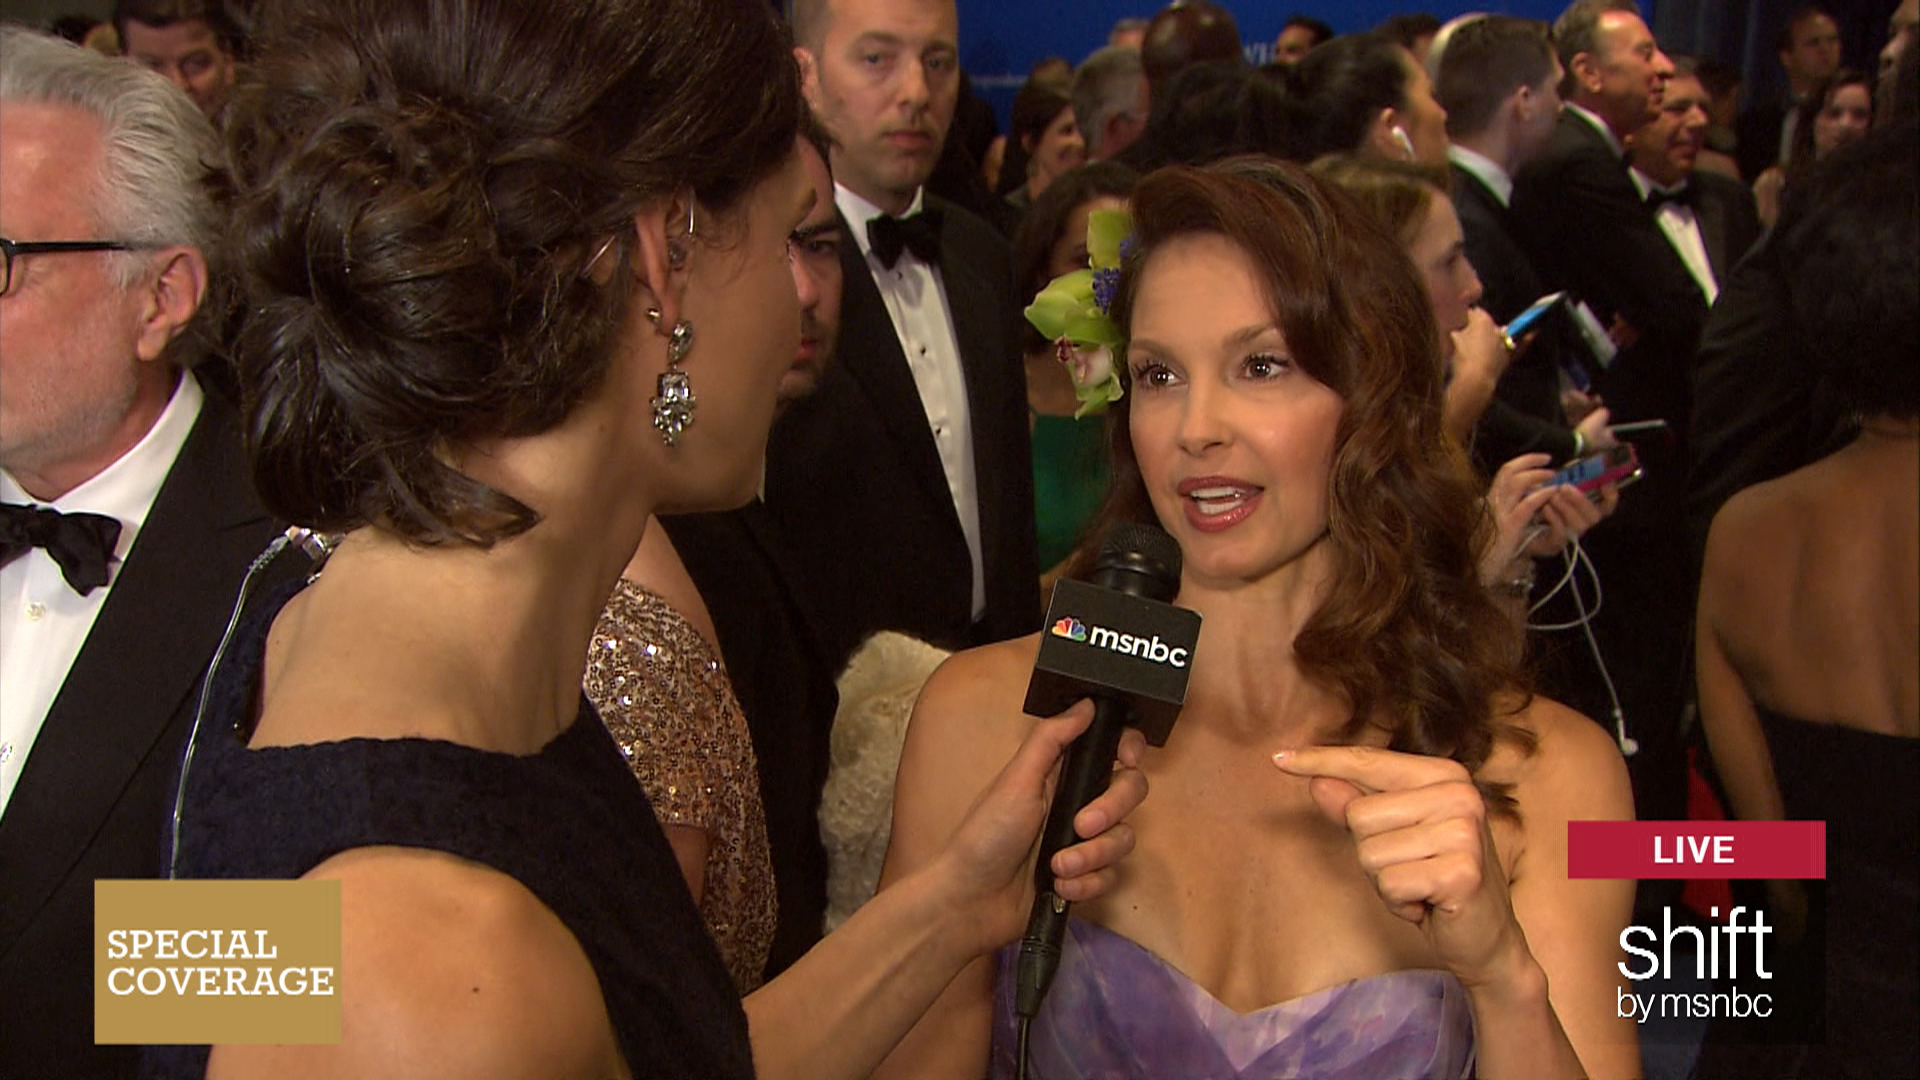 Ashley Judd on her 'rallying cry' op-ed